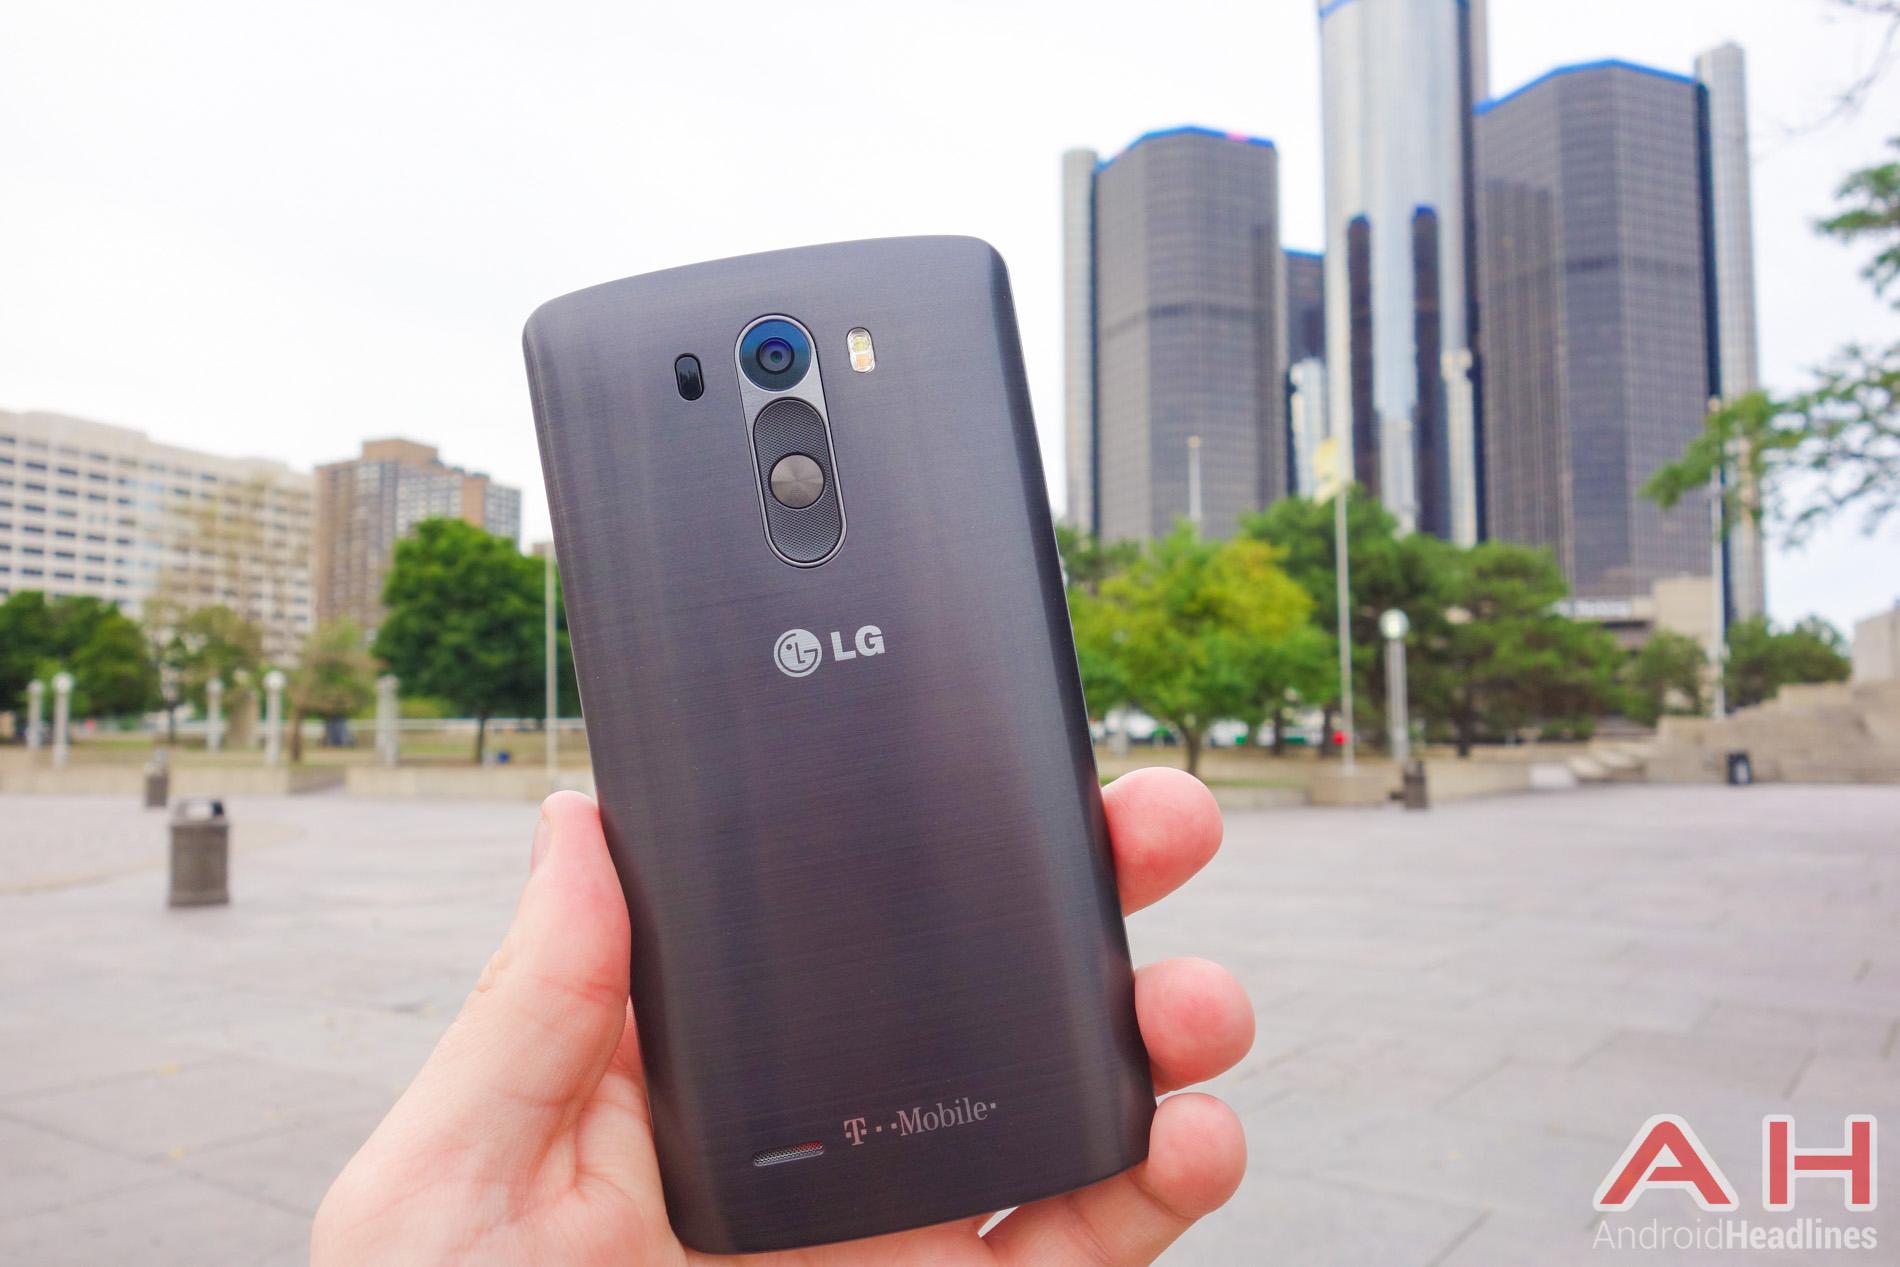 LG-G3-AH-5